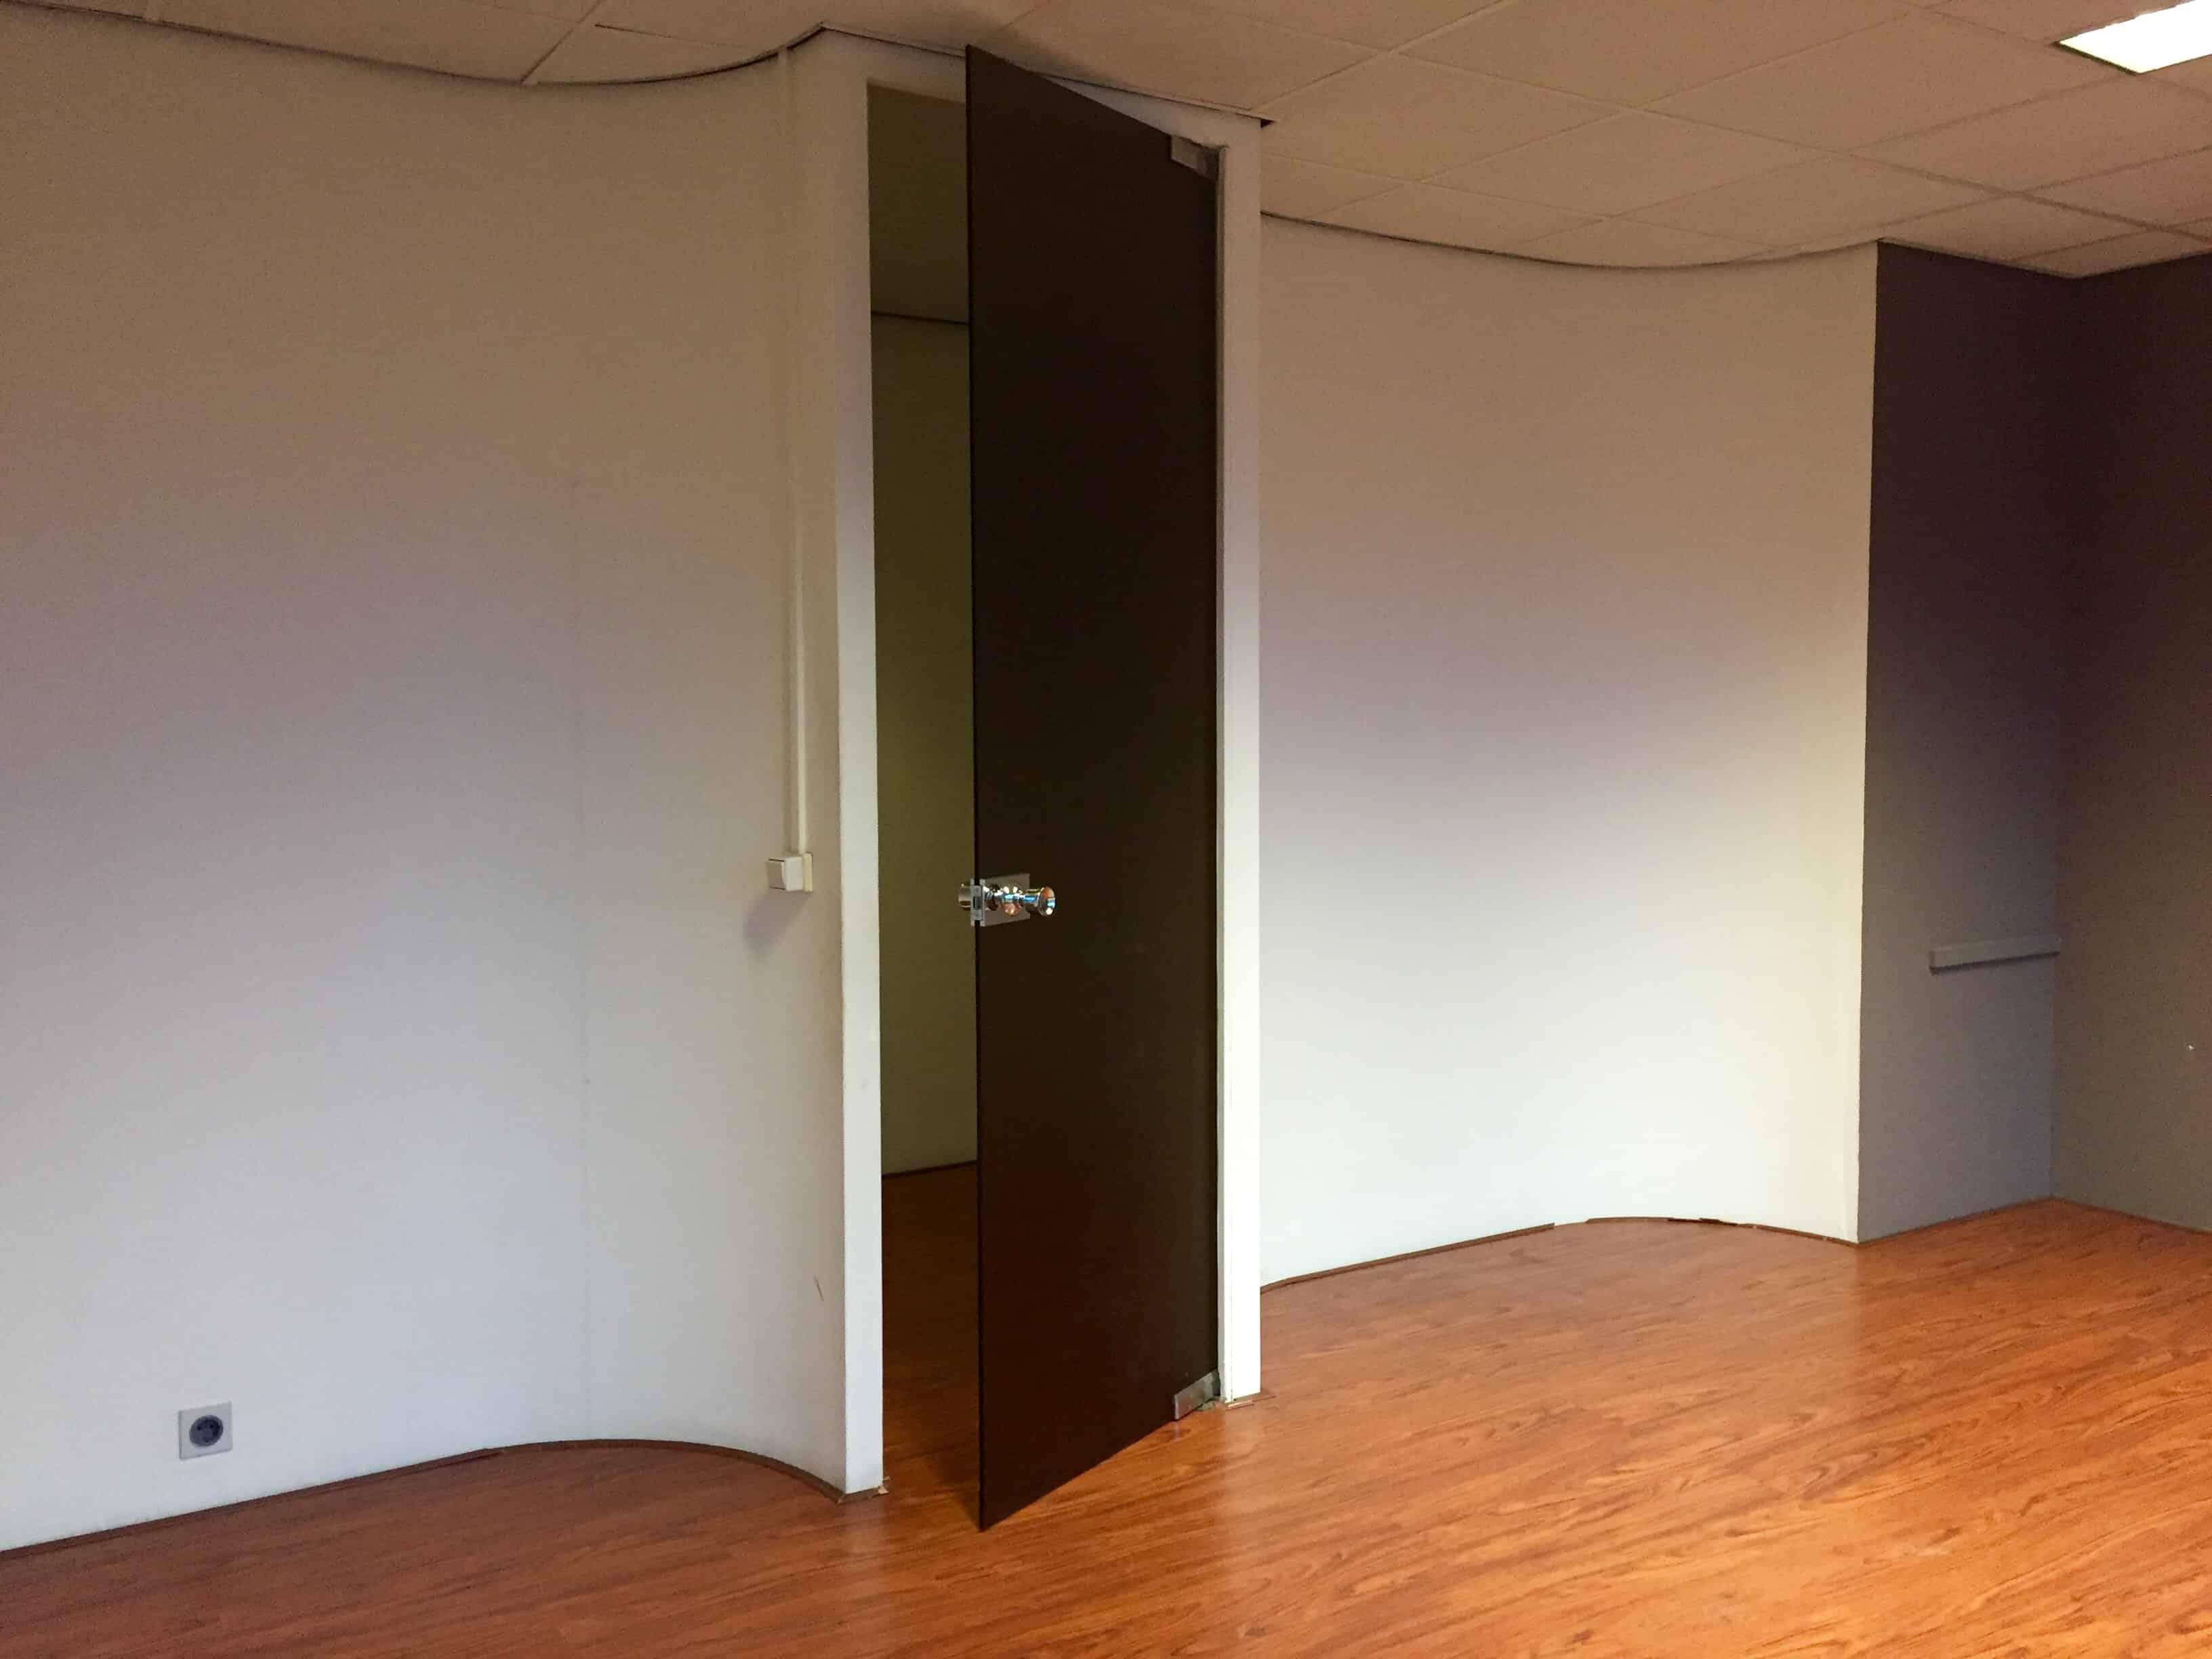 zaandam-kantoor-3